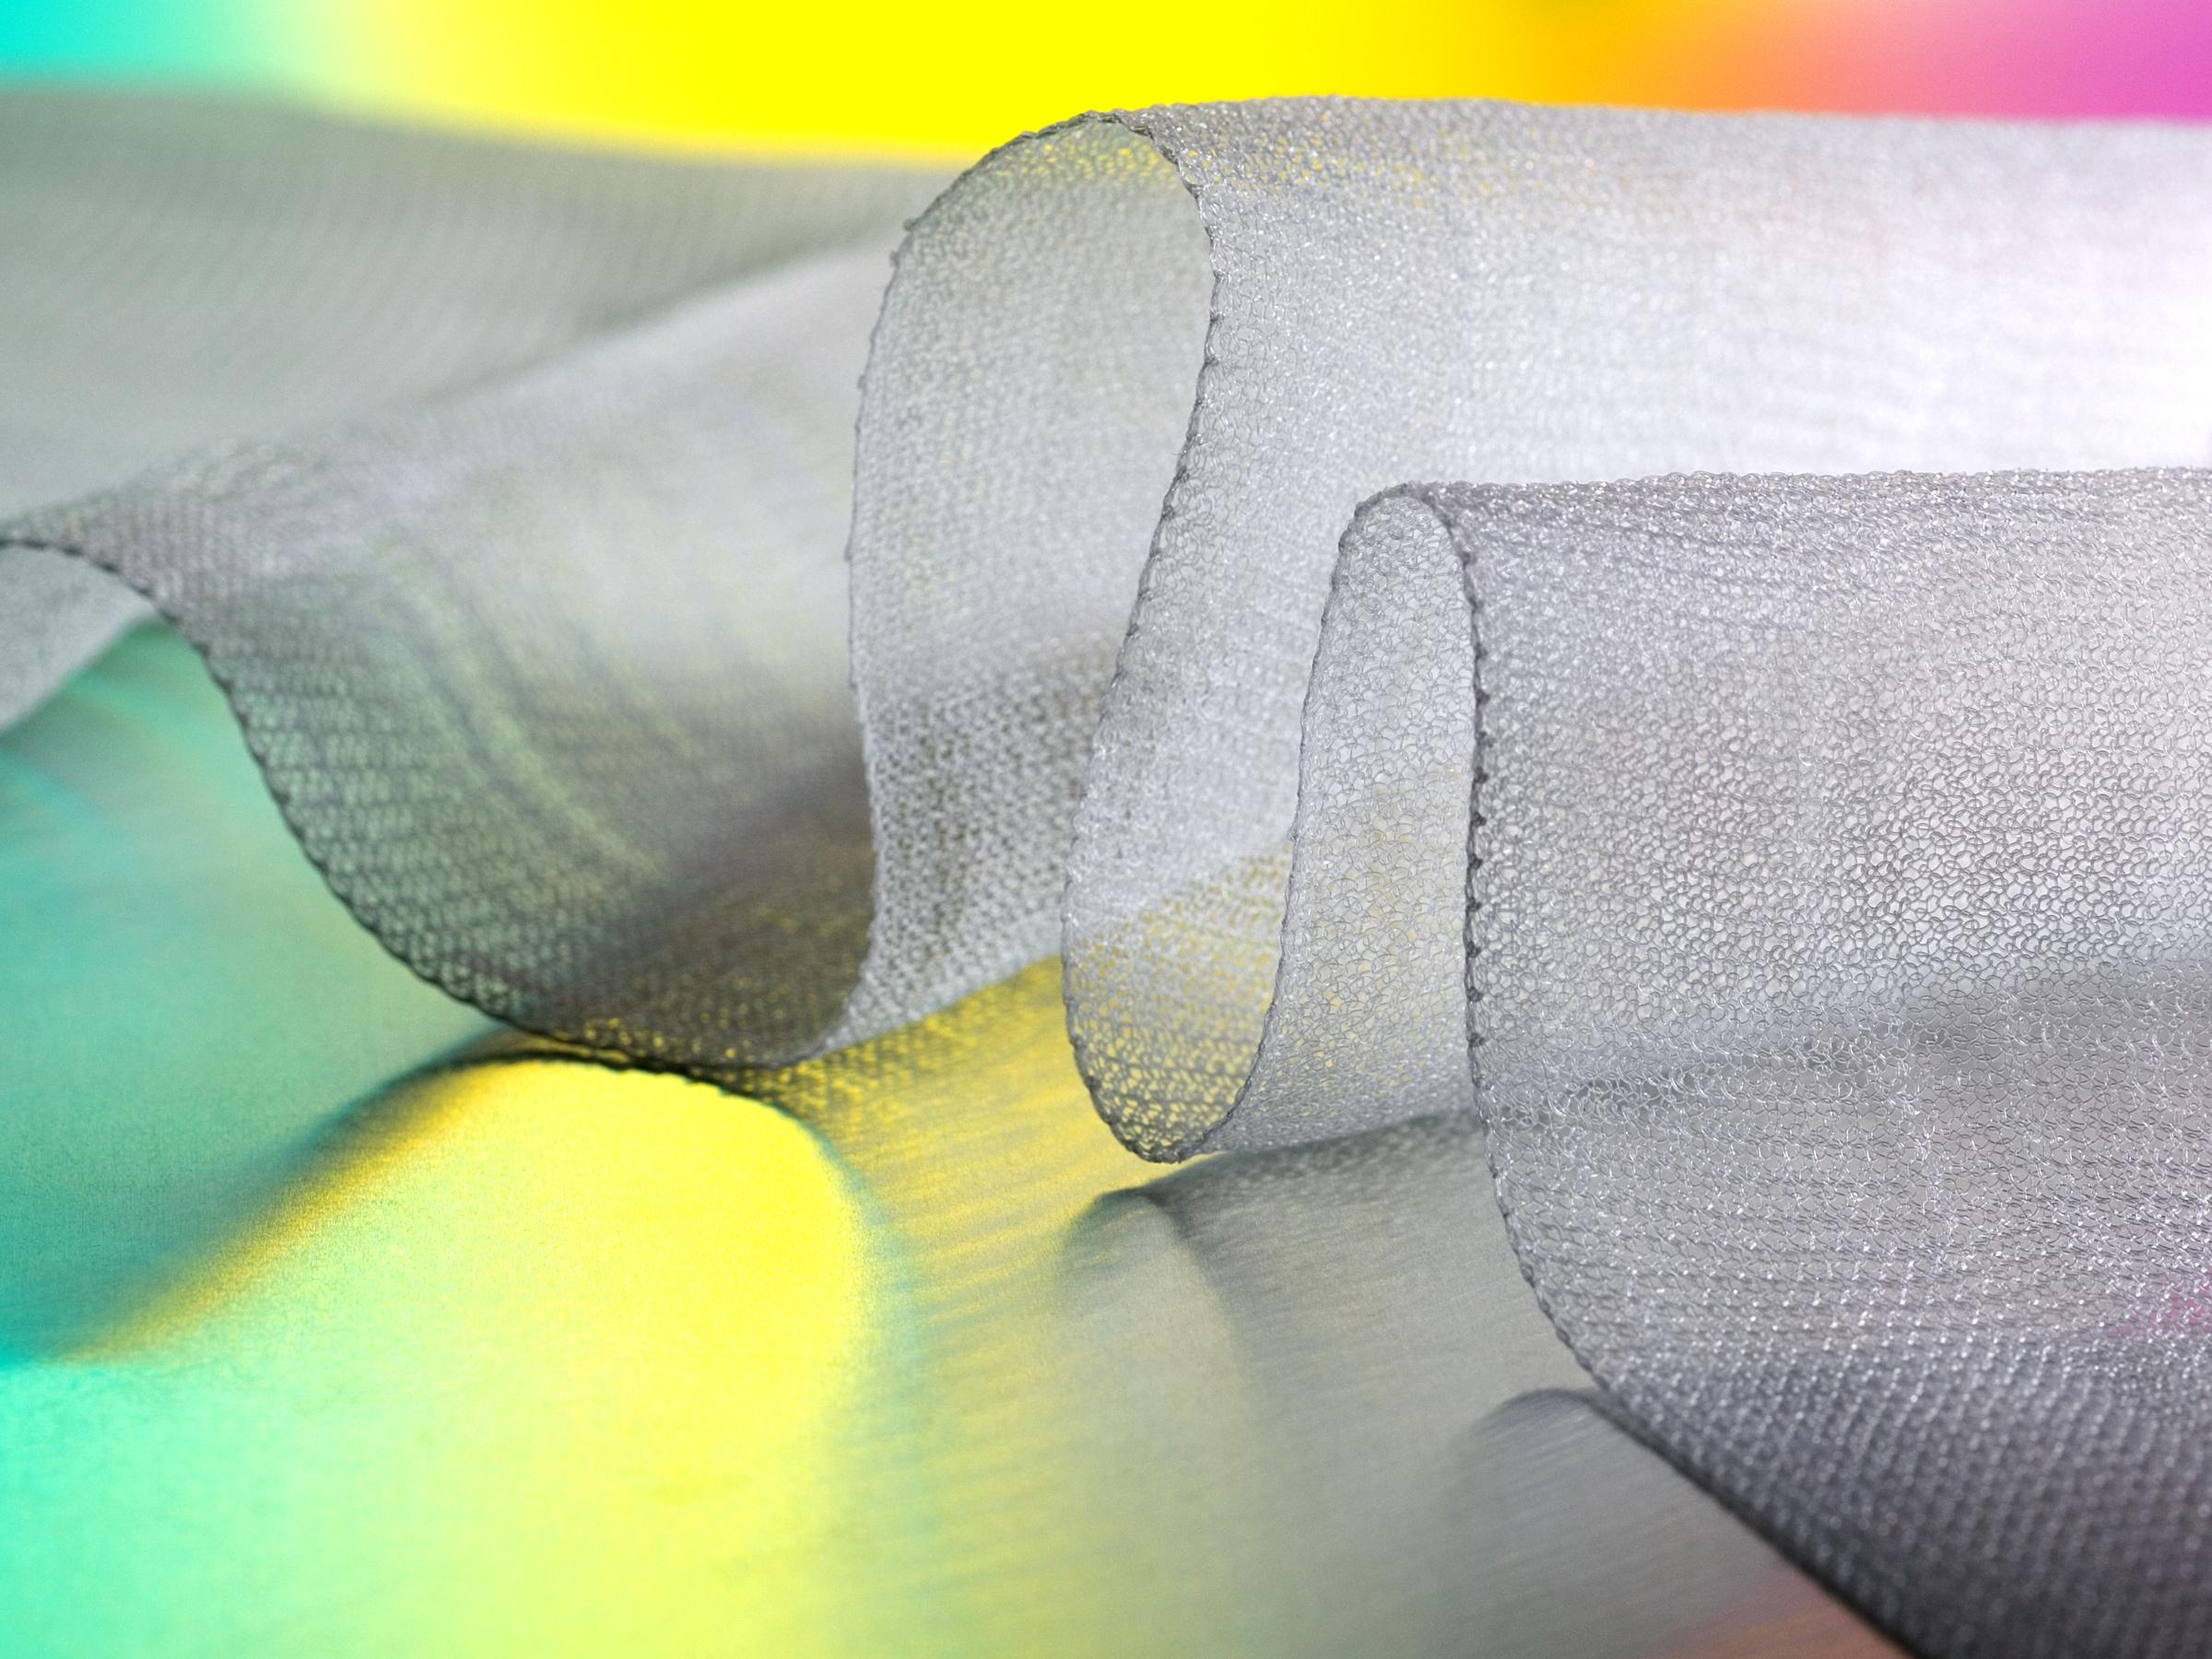 Malla Quirúrgica TephaFLEX hecha de filamentos tejidos de biopolímeros absorbibles TephaFLEX. Fotografía de: Jeffrey Titcomb Studio.